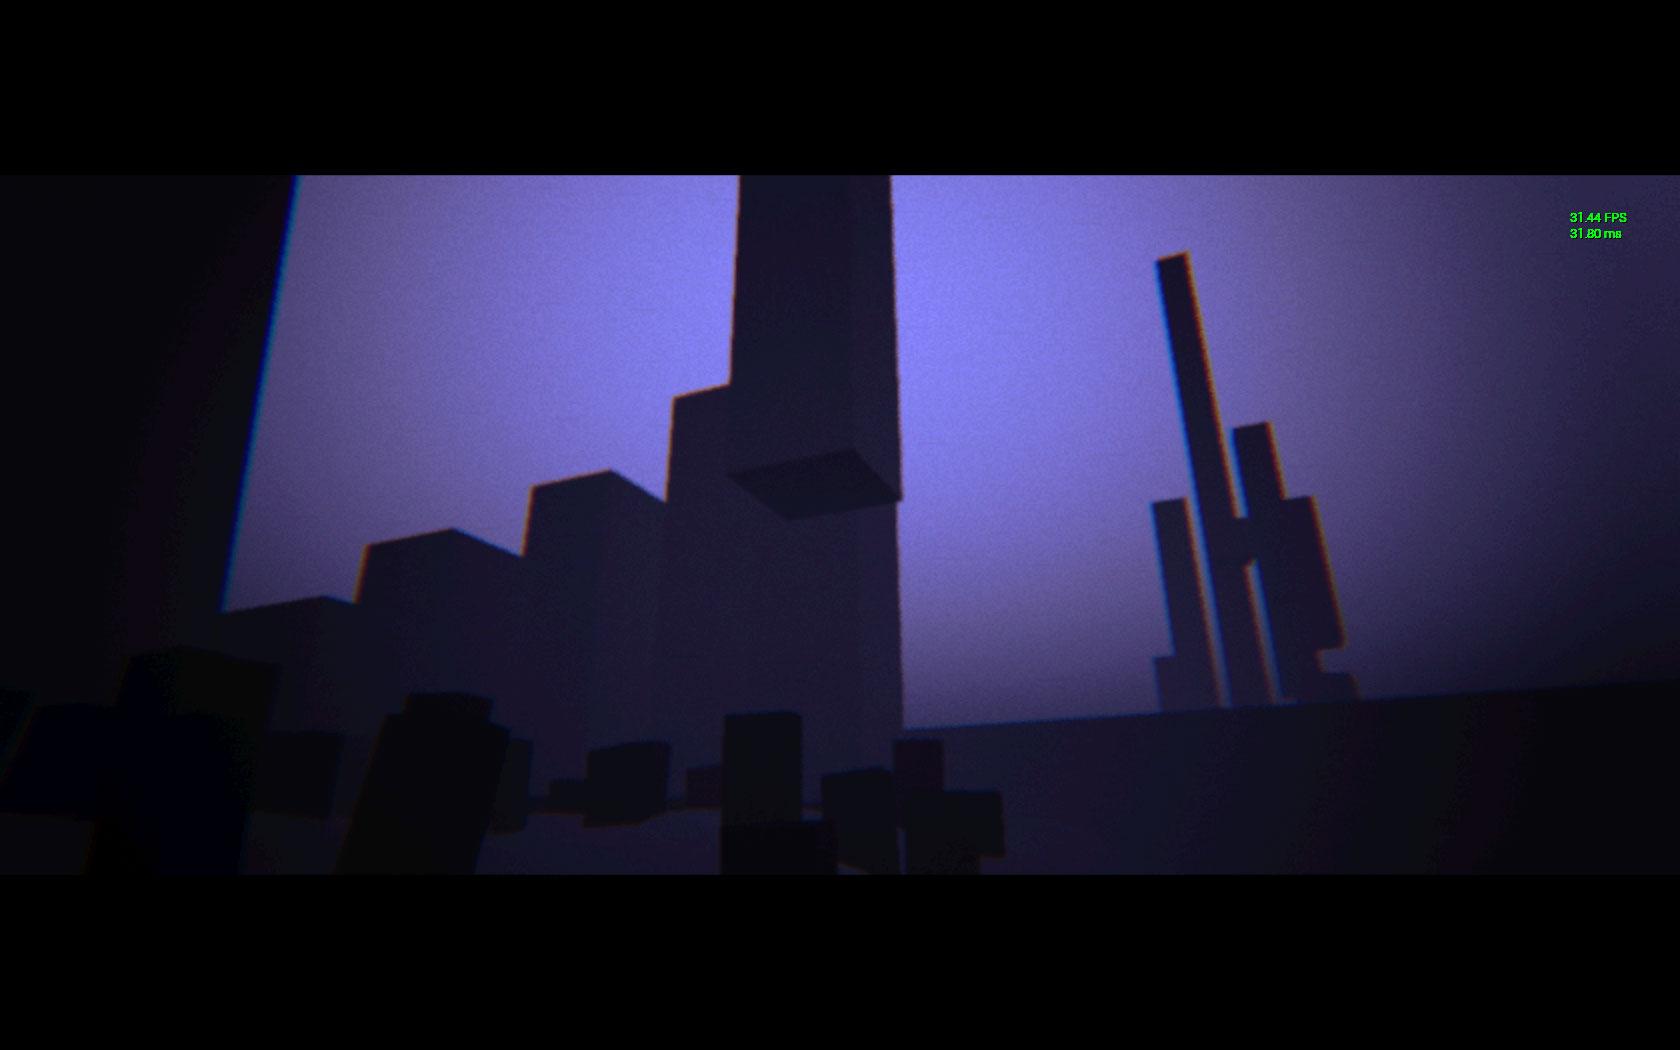 singmetosleep (dark surreal narrative) UE4 VR